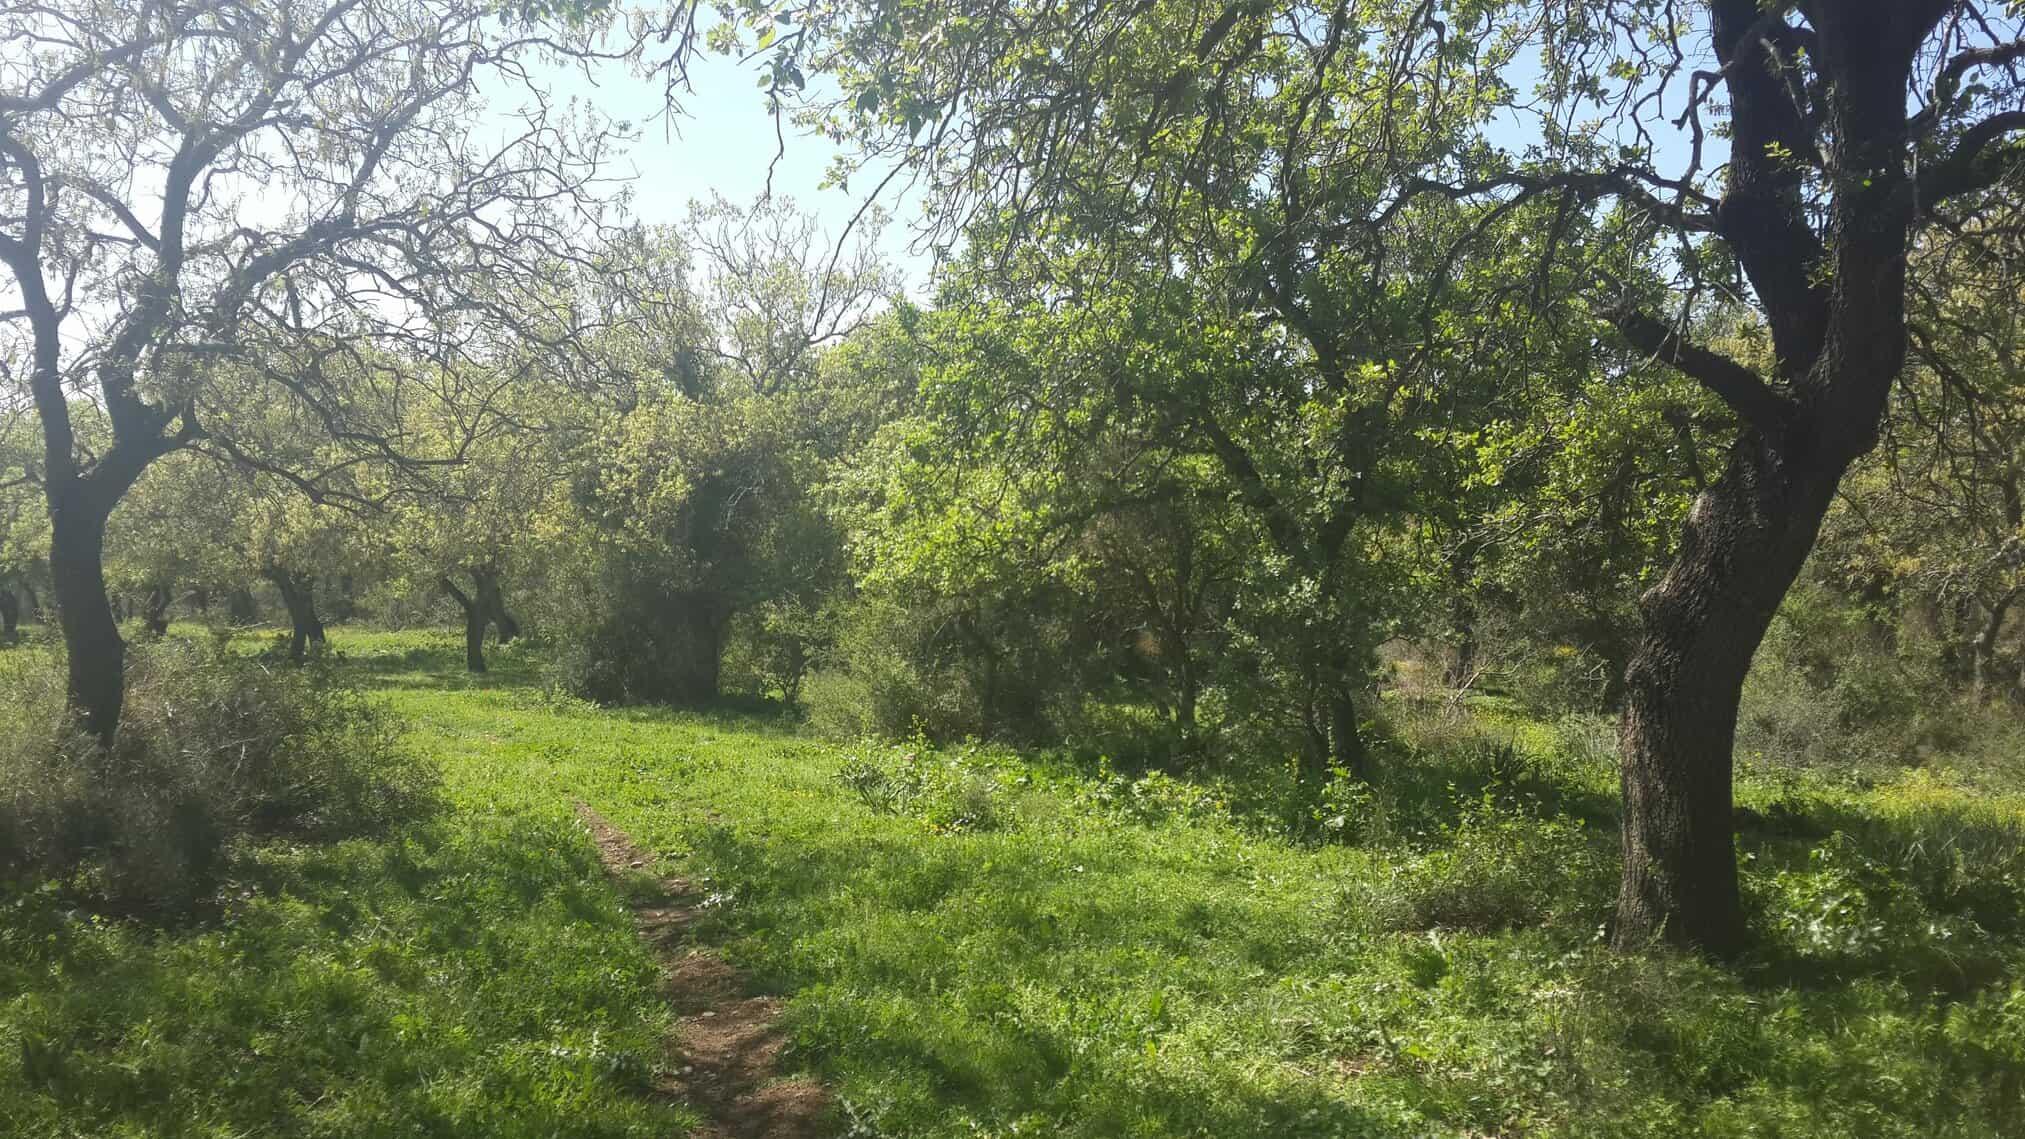 ליקוט ביער עמיקם